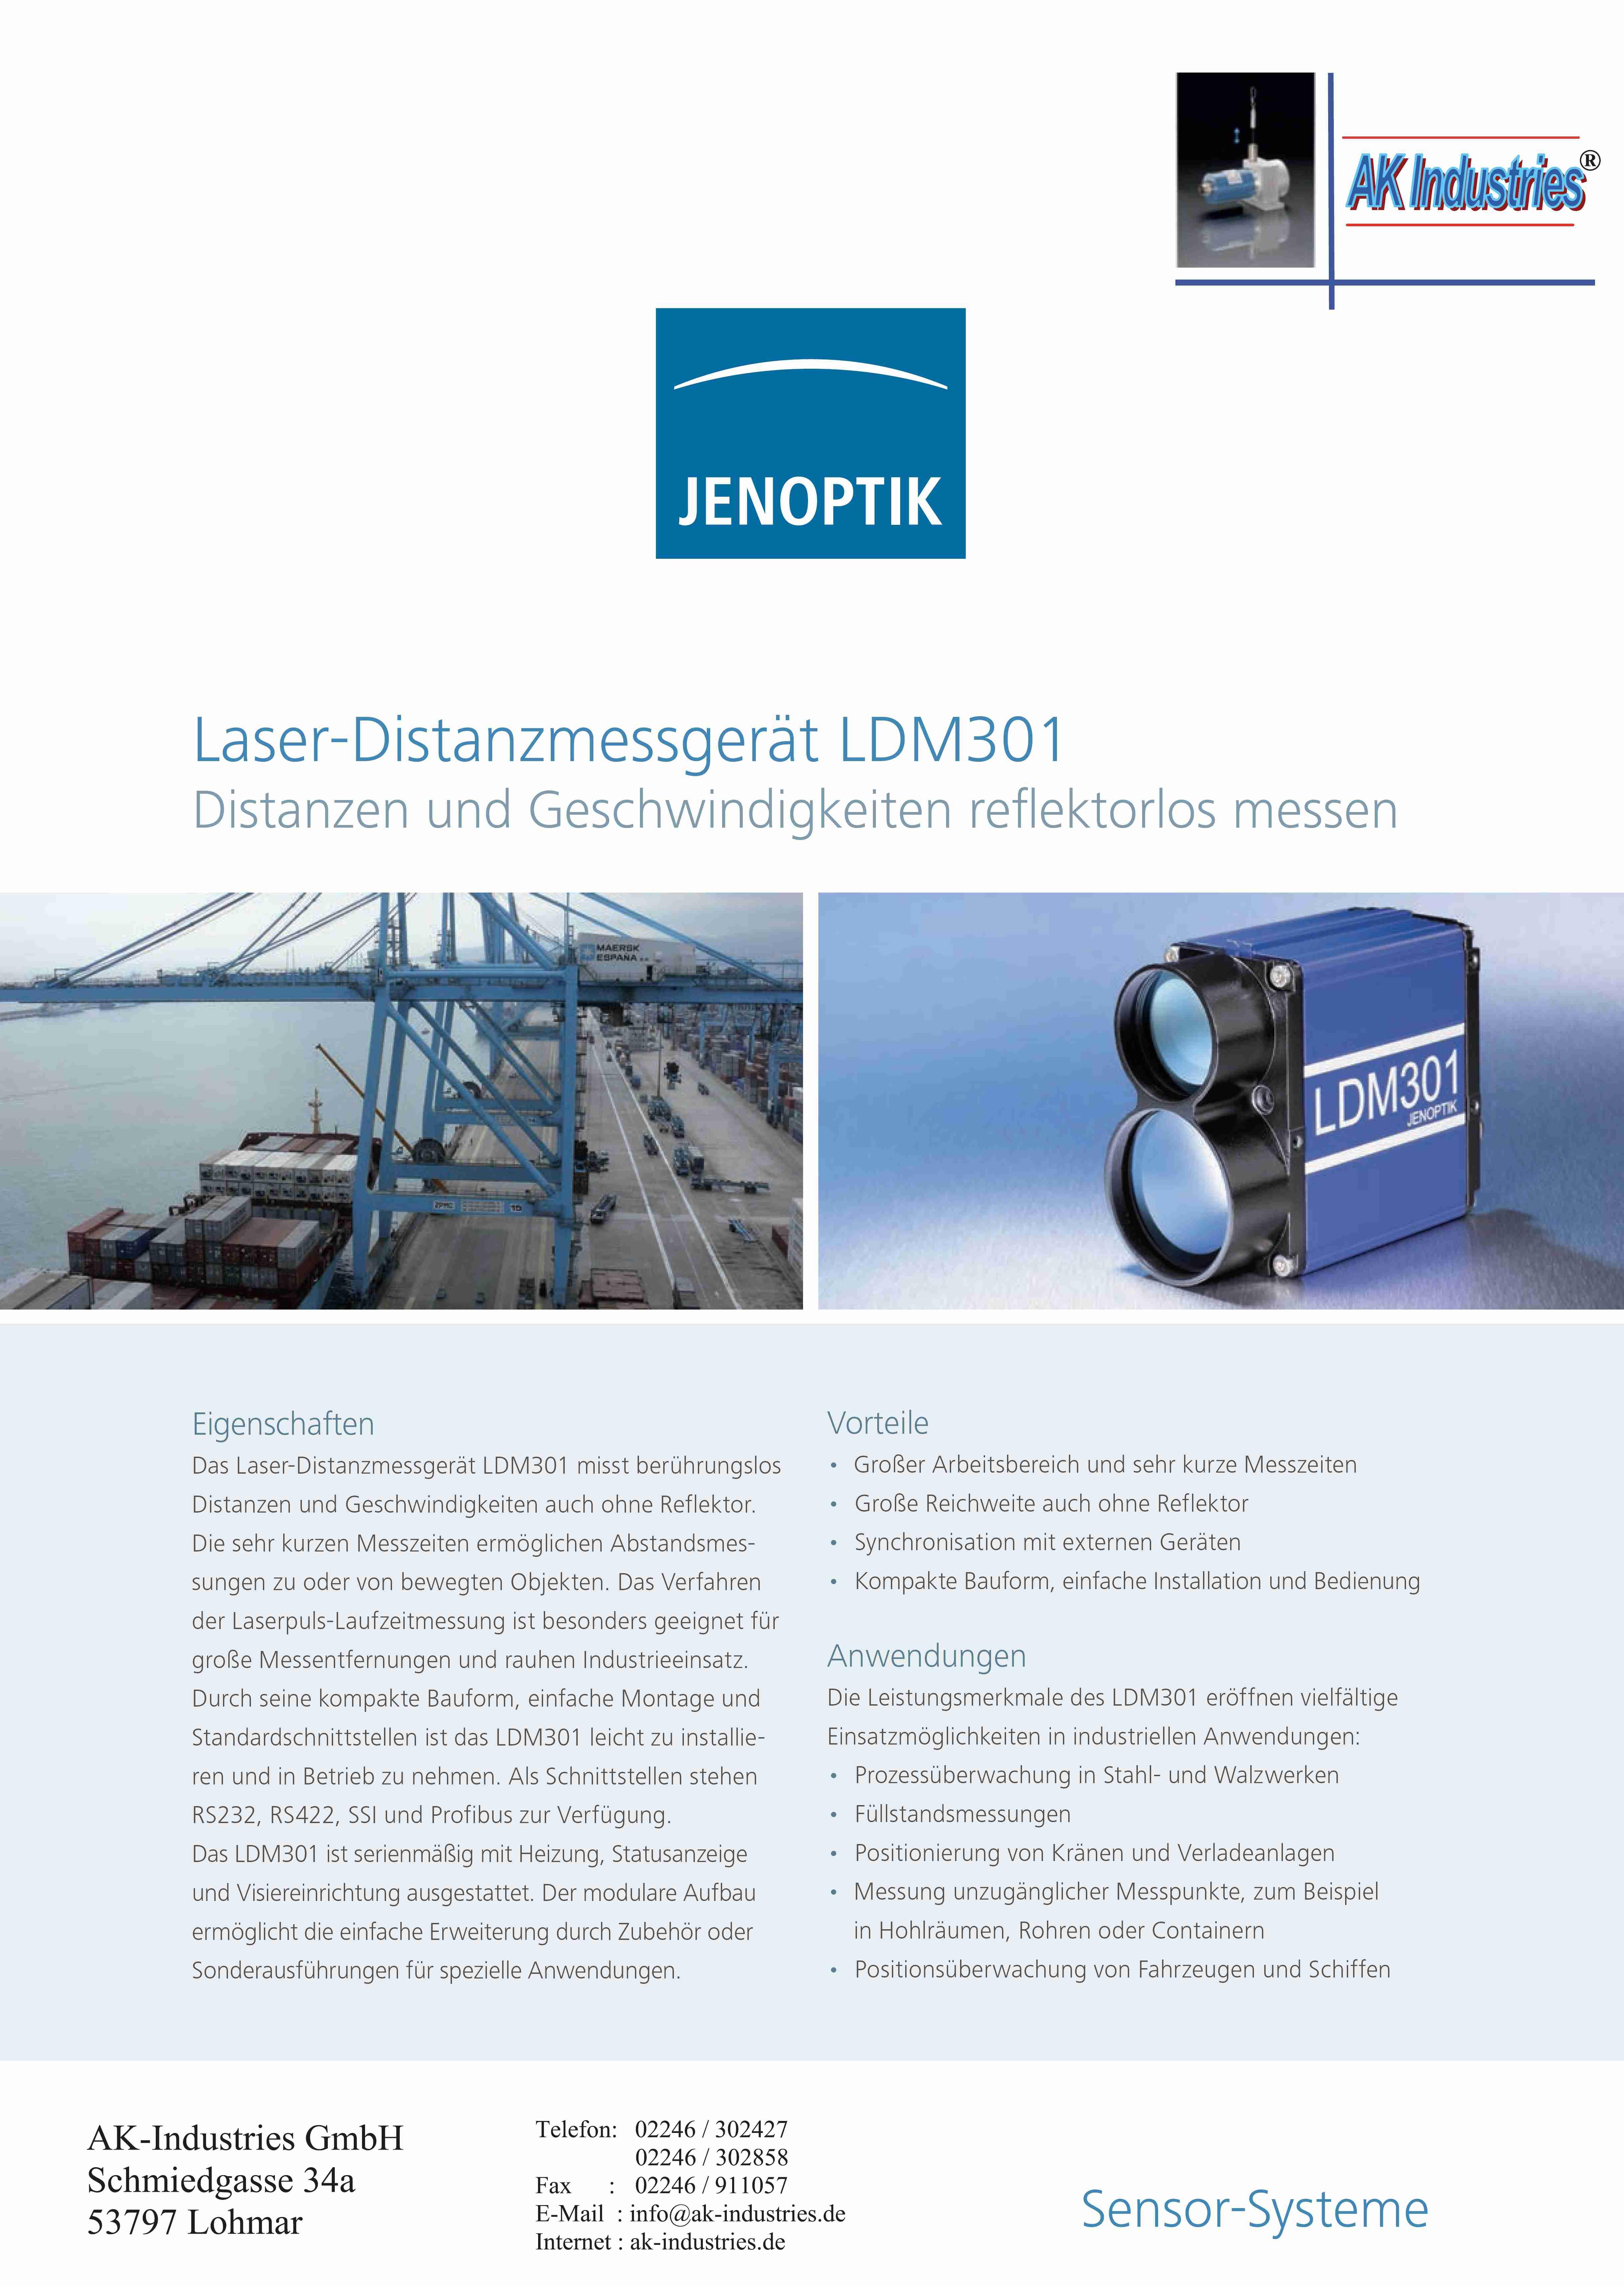 LDM301 Jenoptik Laser